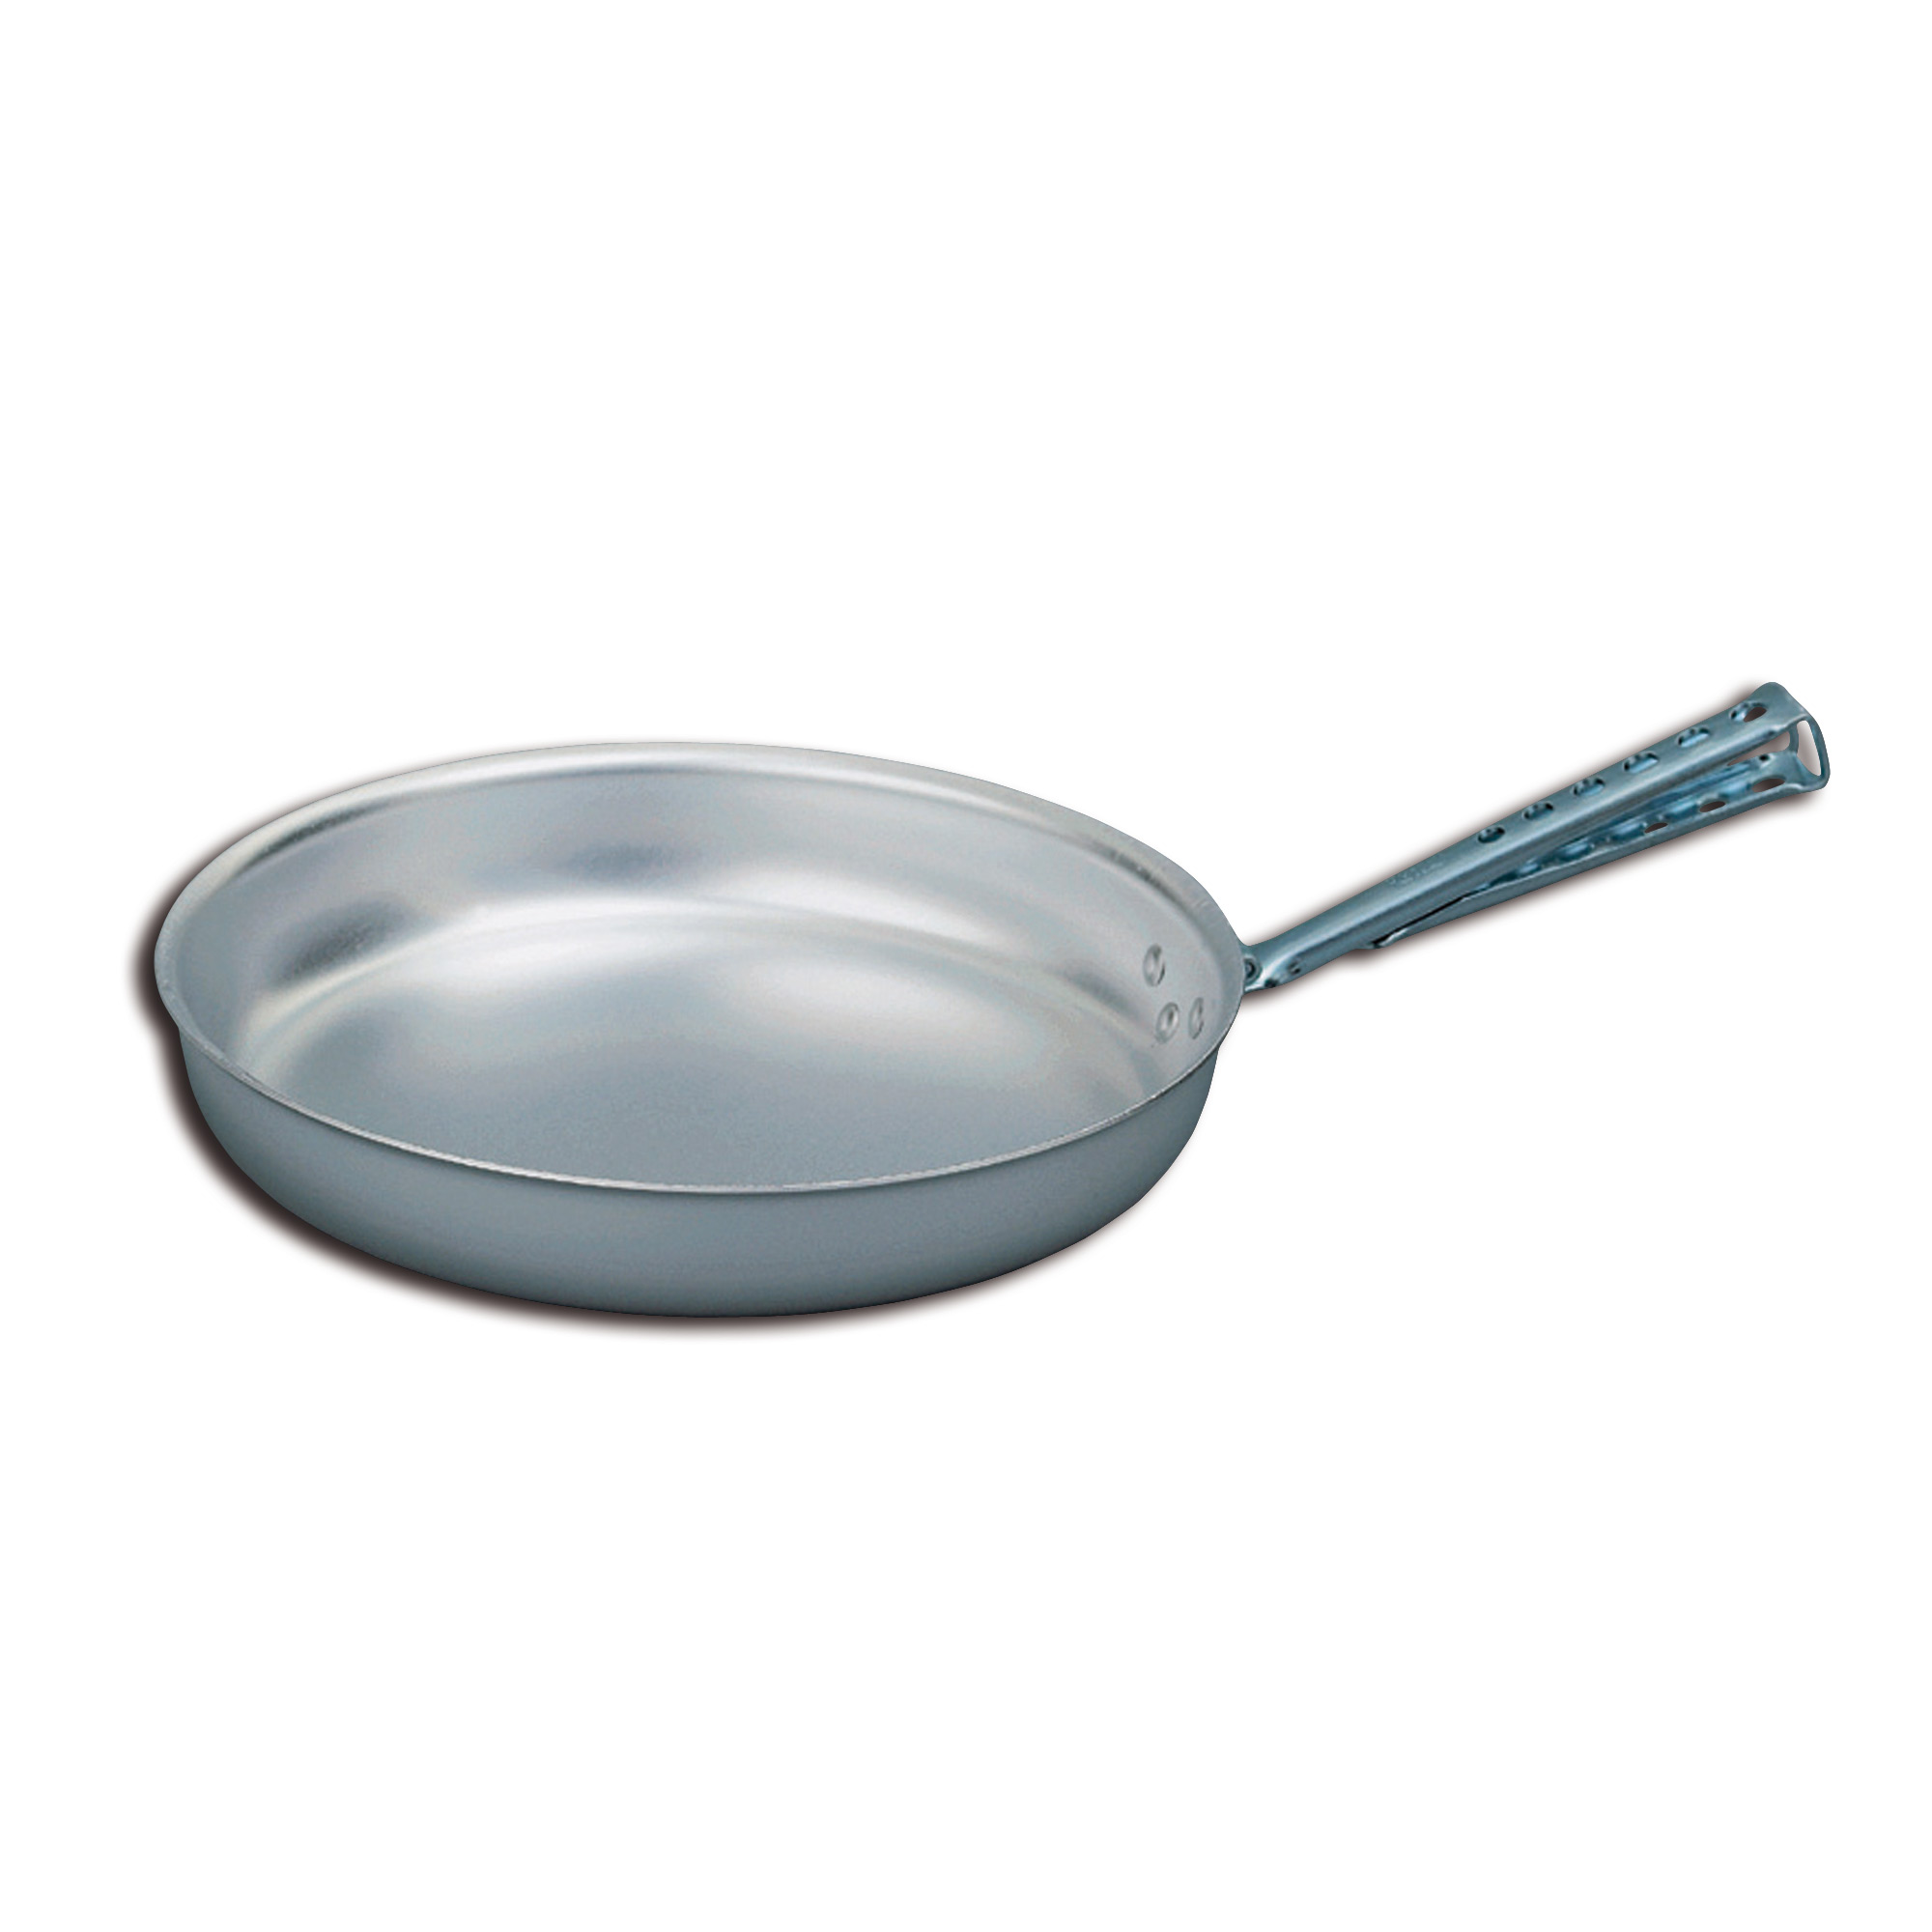 Trangia Frying Pan Aluminium 20 cm